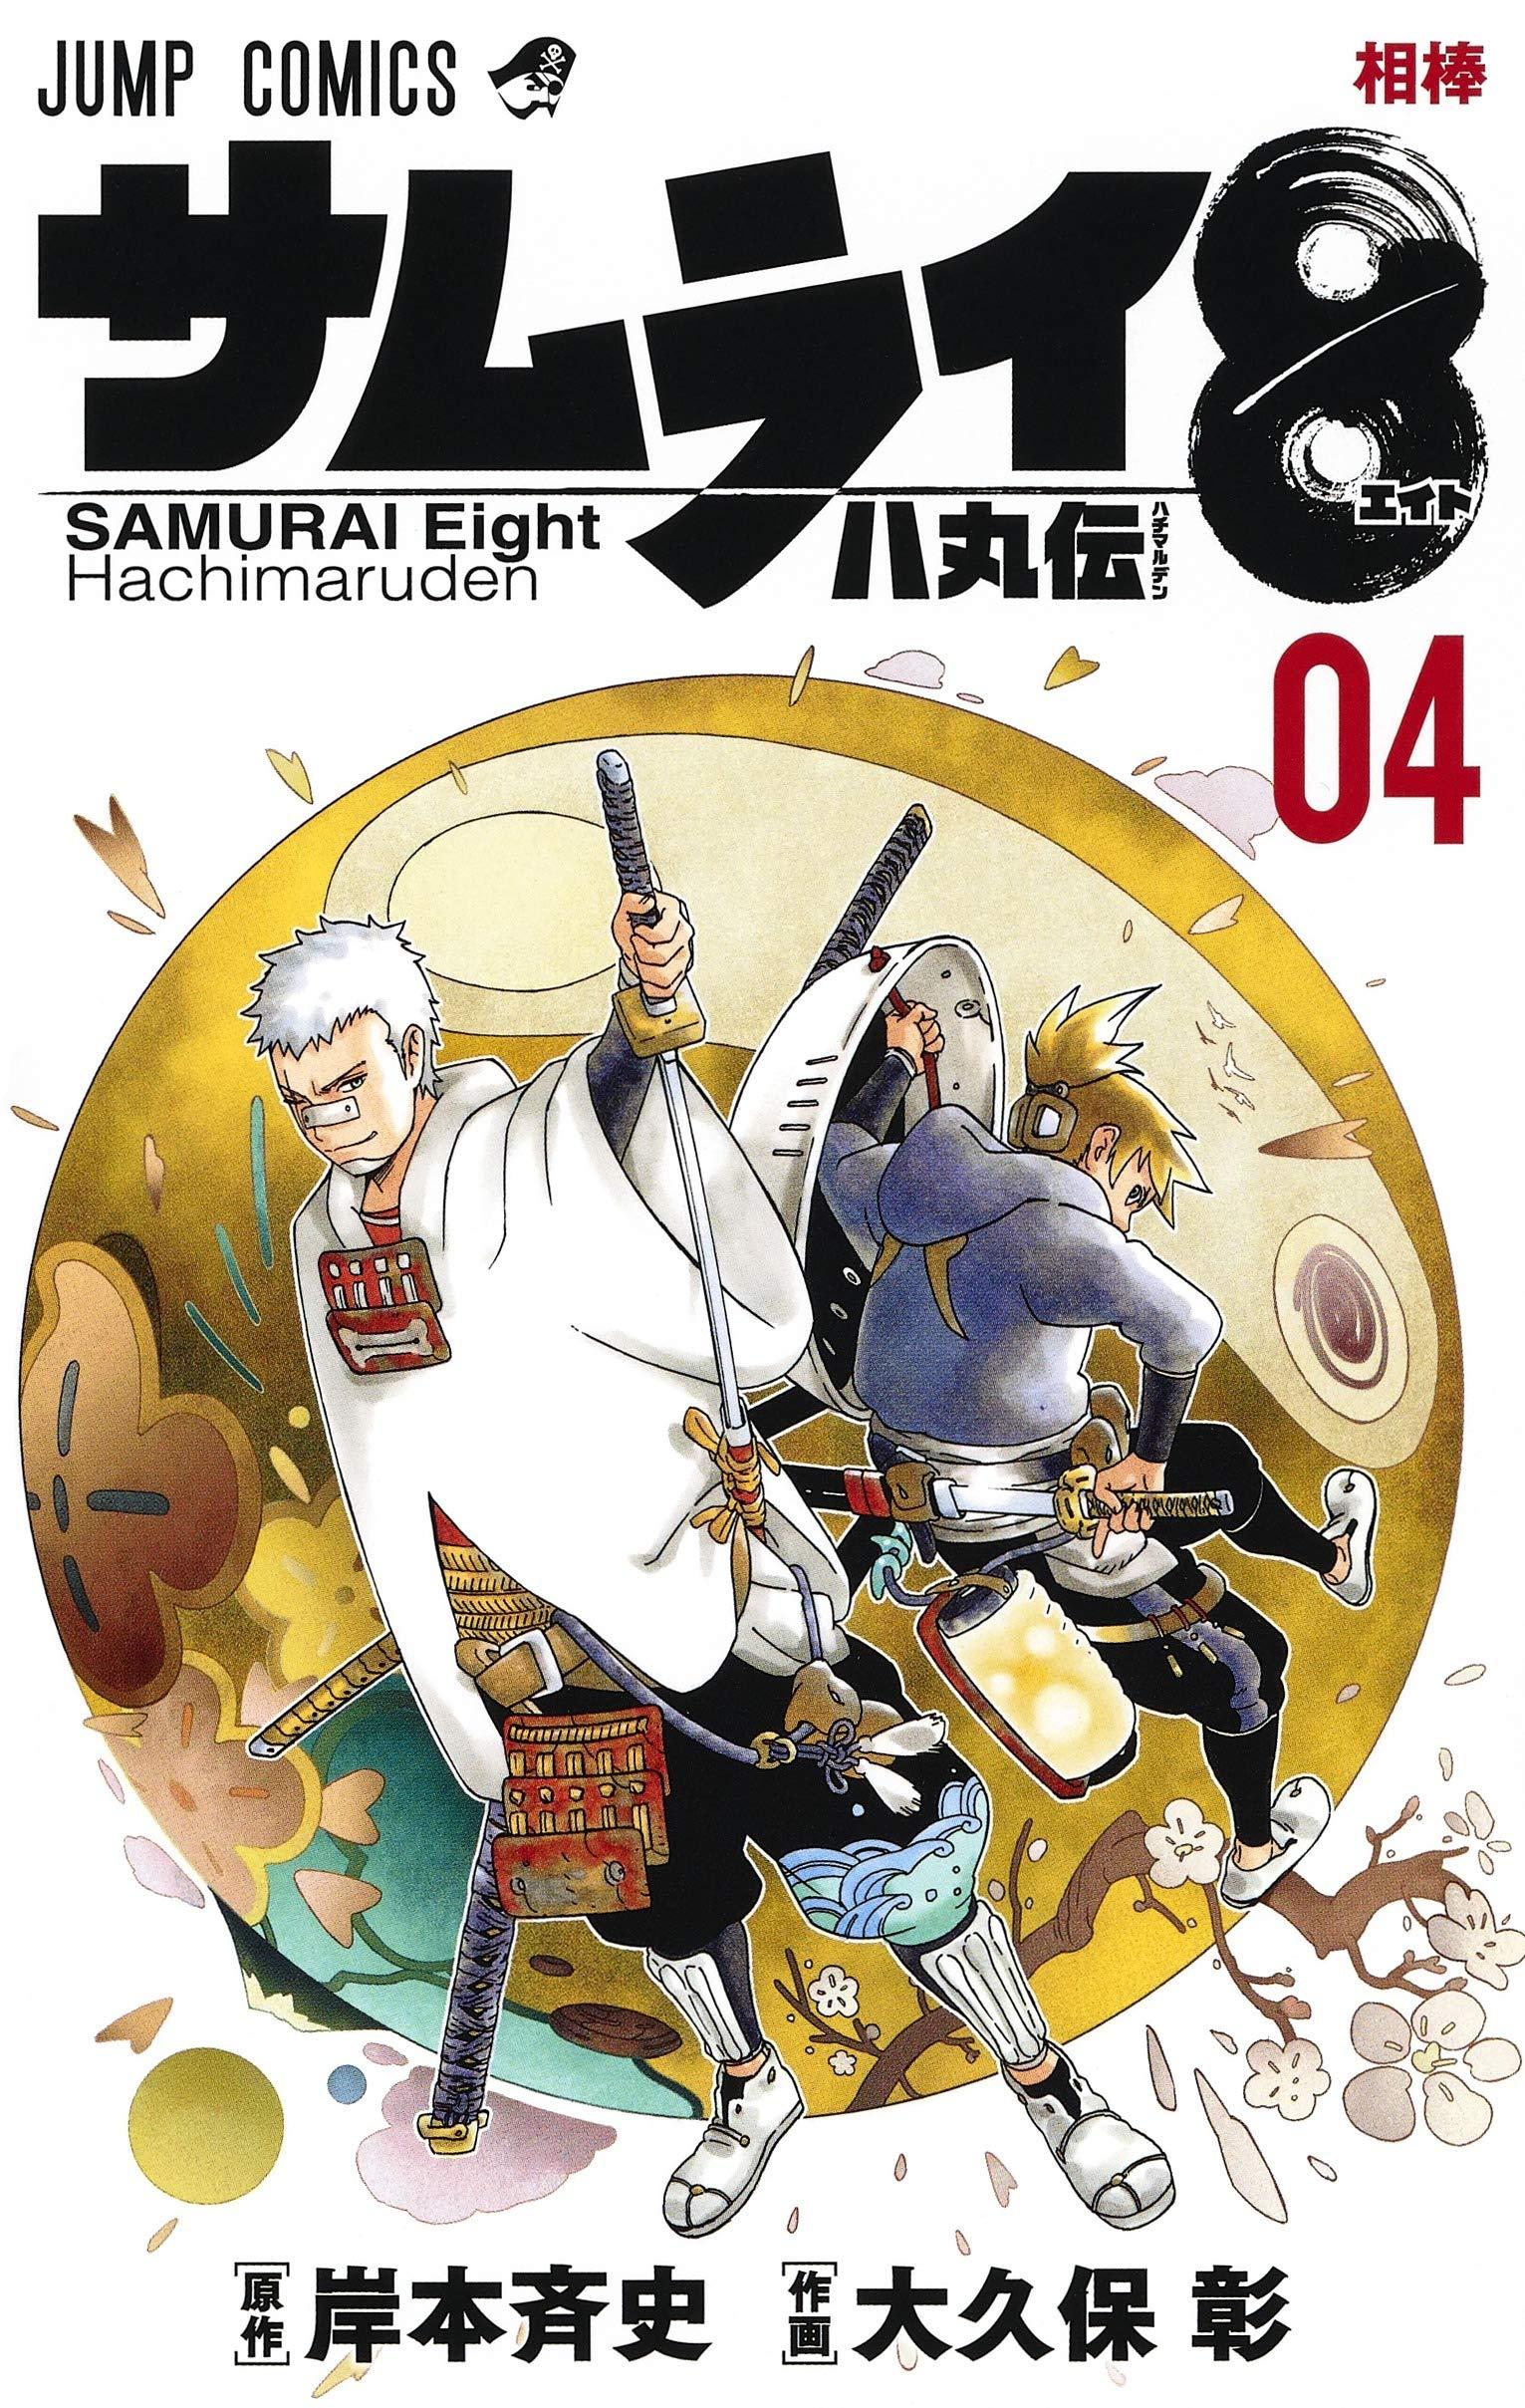 Samurai 8 Manga Volume 4